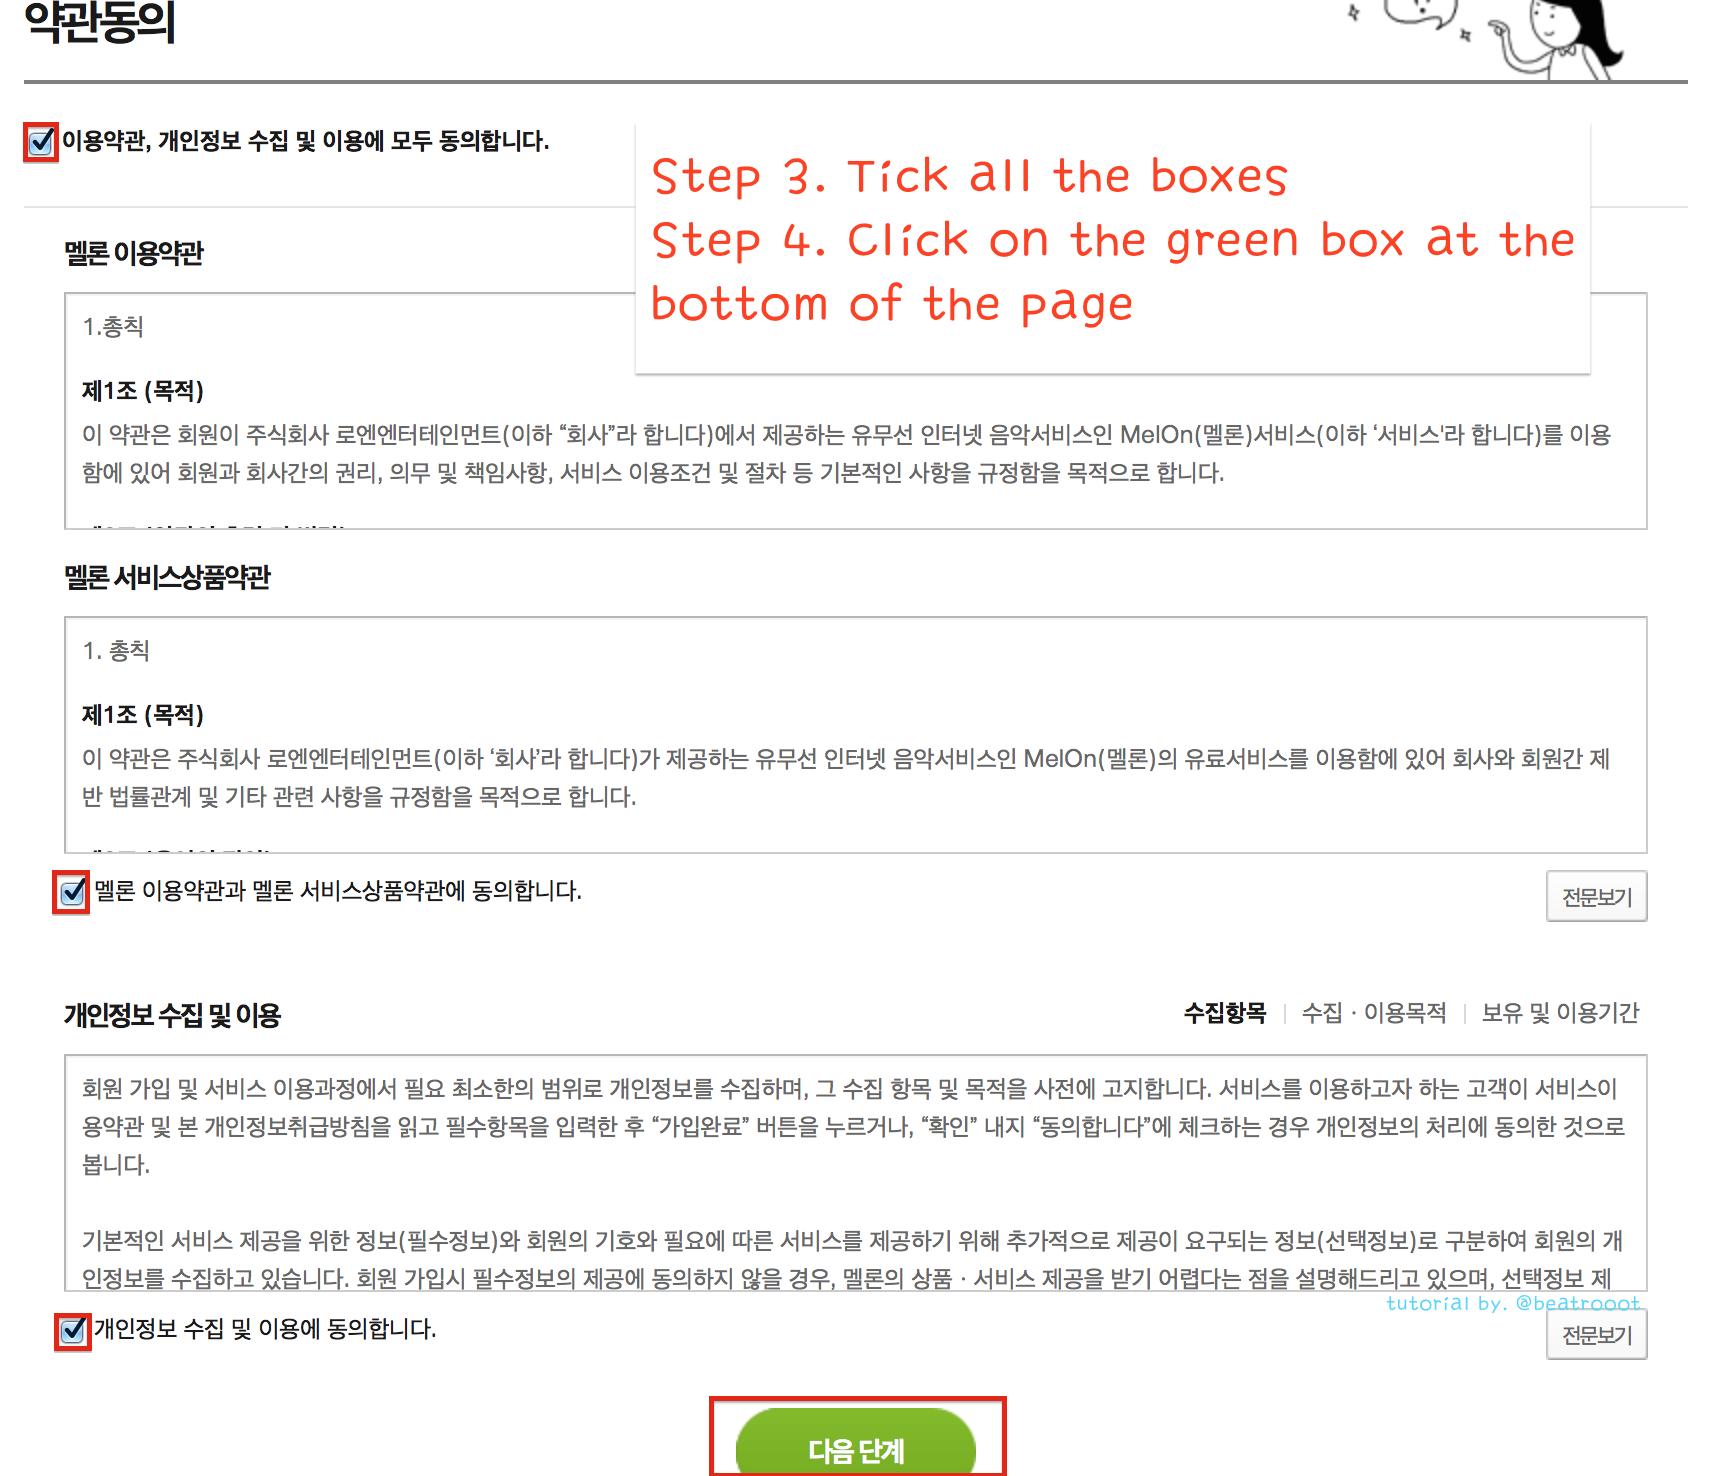 screen_shot_2014-09-15_at_11.58.29_pm.pn